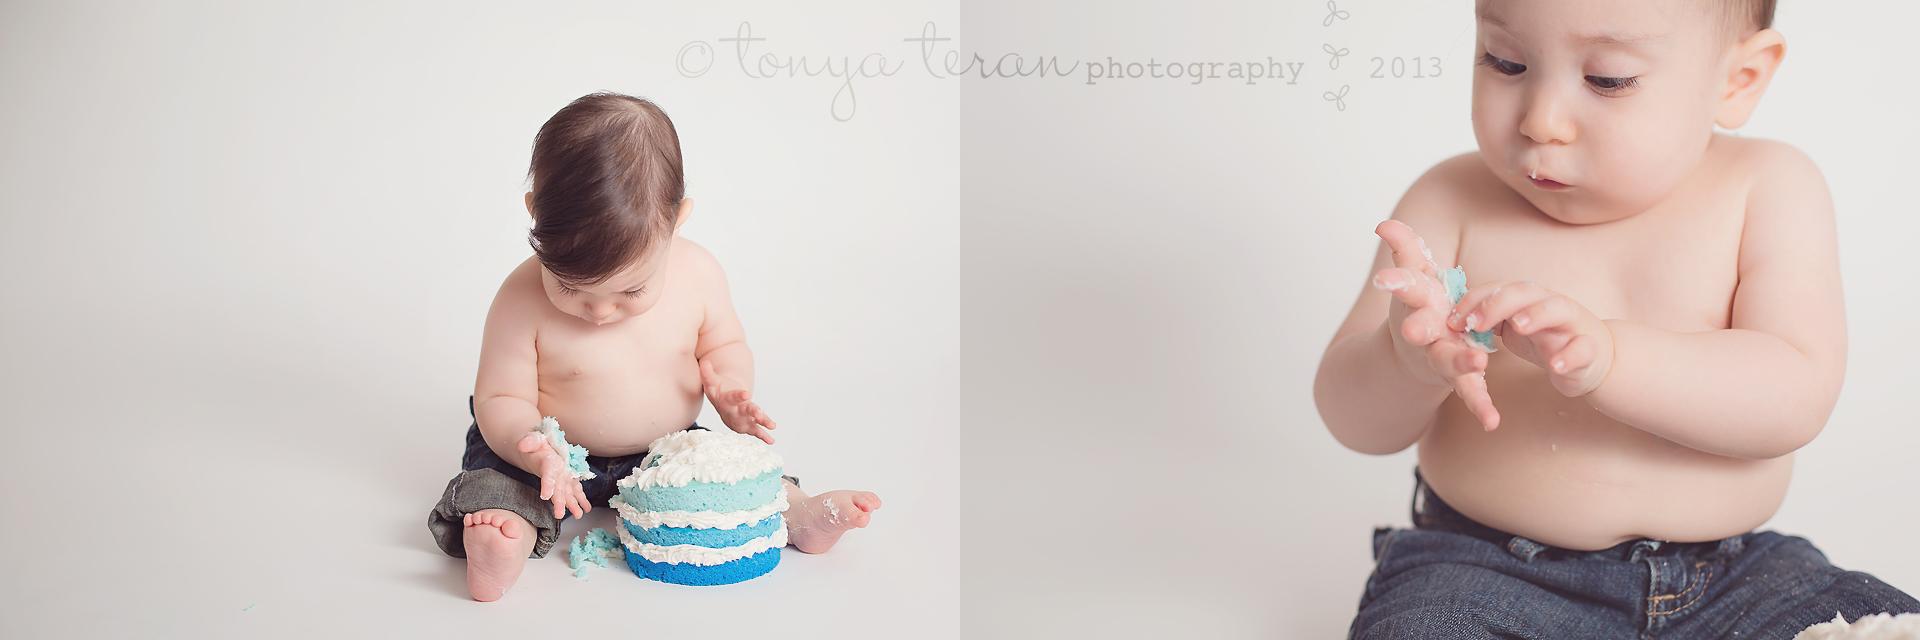 Rockville, MD Baby Birthday Cake Smash Photographer | Tonya Teran Photography